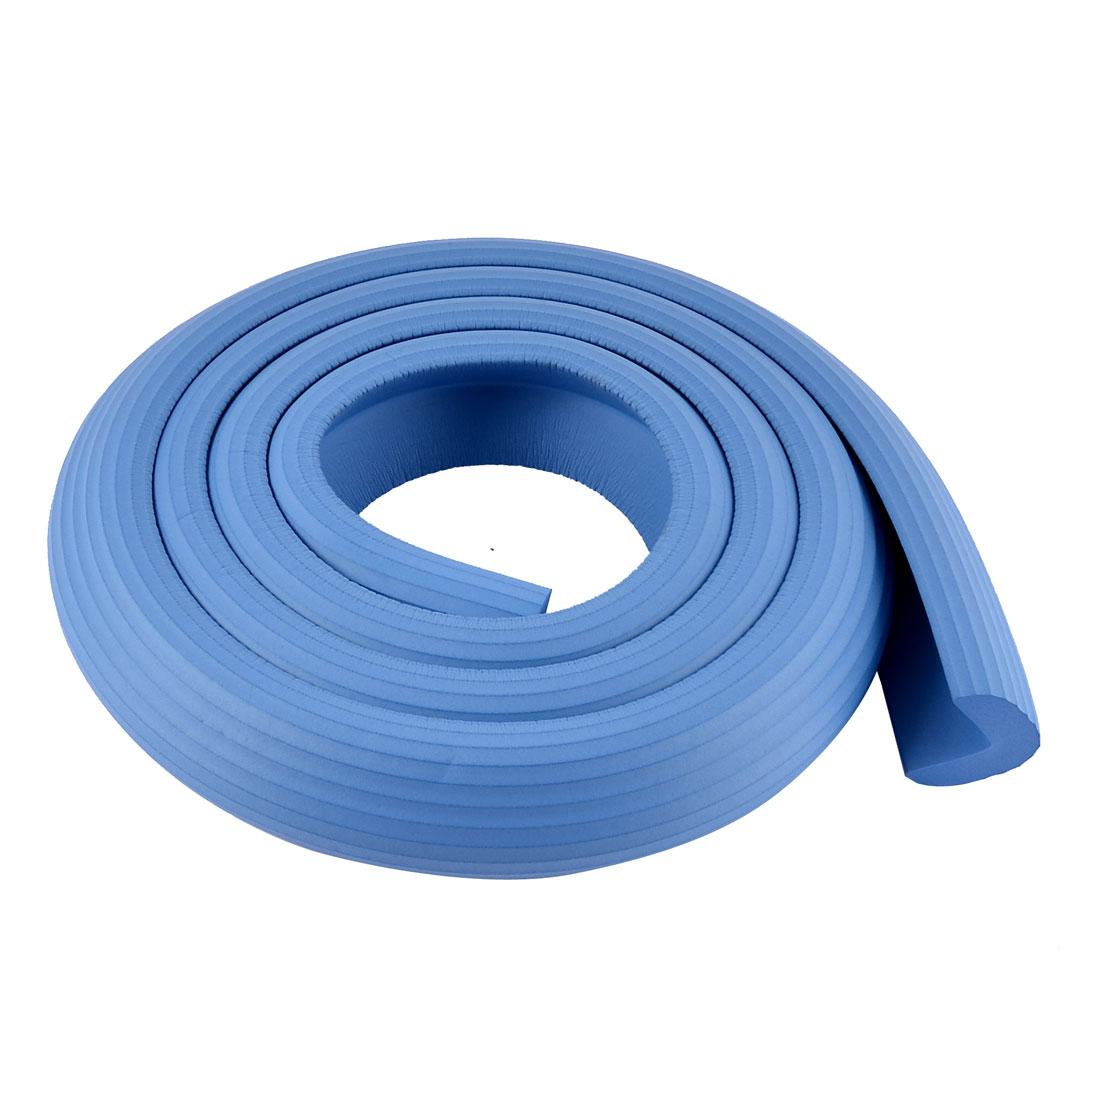 Furniture Corner Edge Soft Safety Protection Cushion Guard Sky Blue